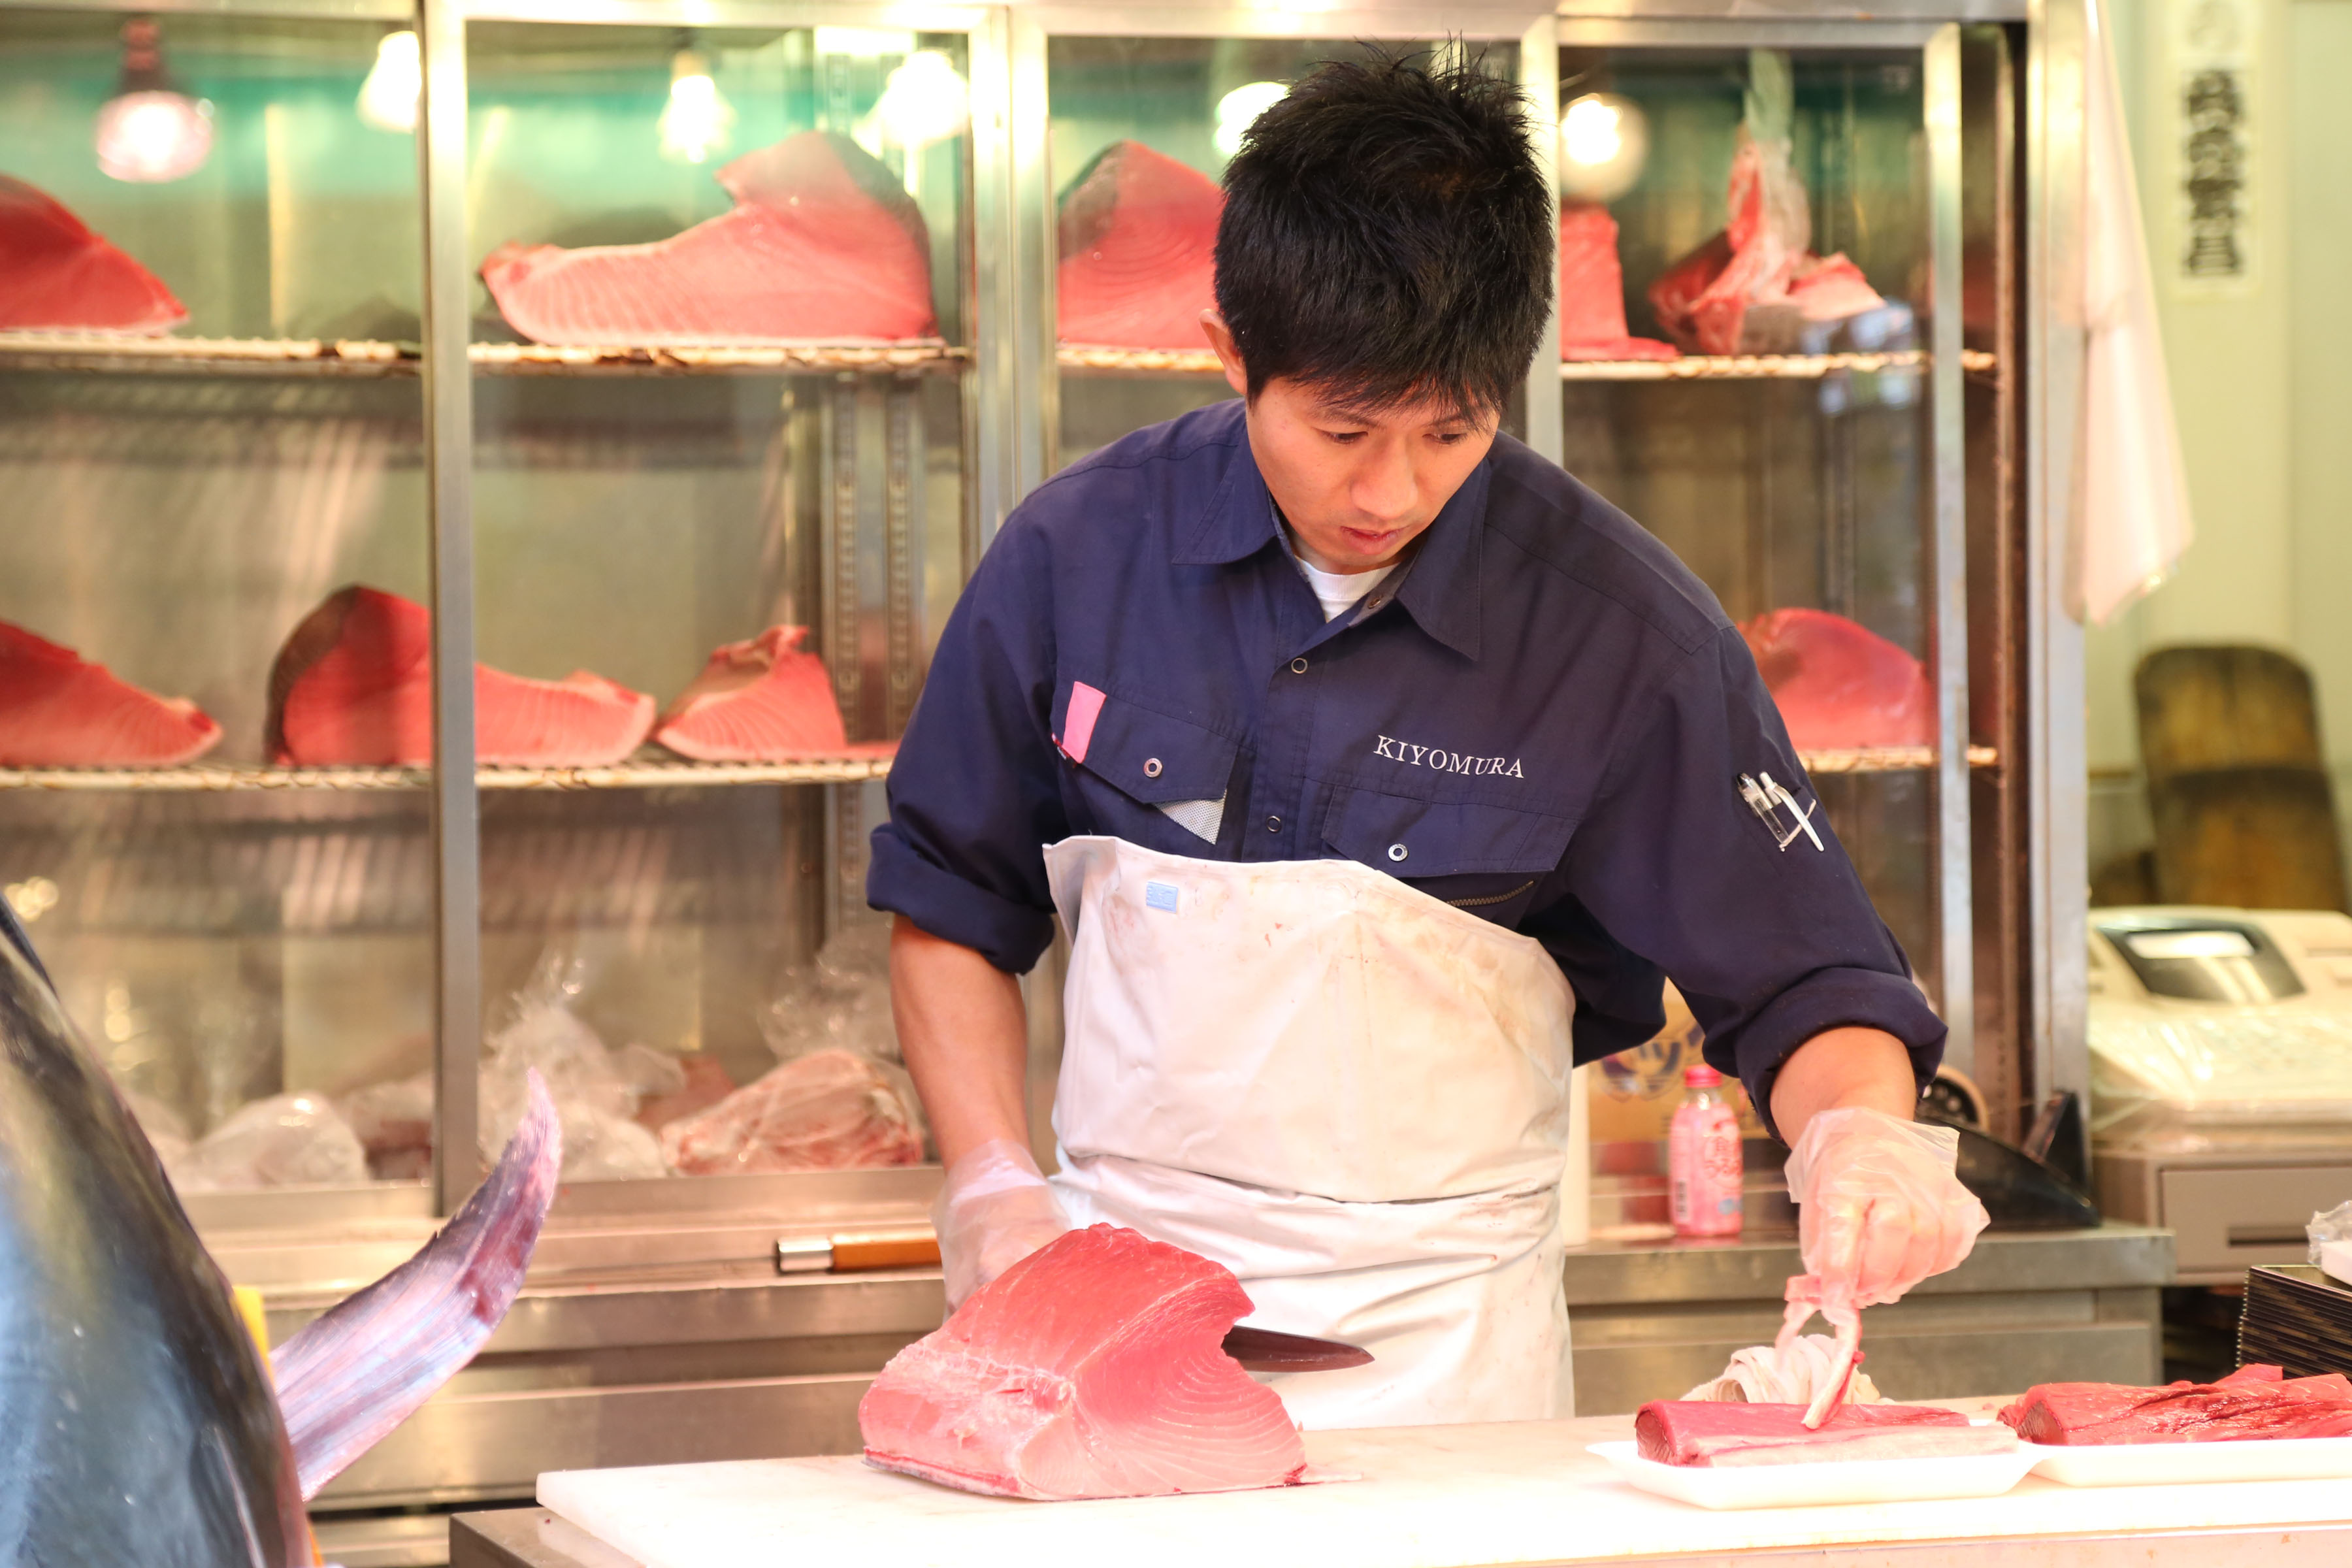 Sushi being prepared,Tsukiji Fish Market, Tokyo, Japan